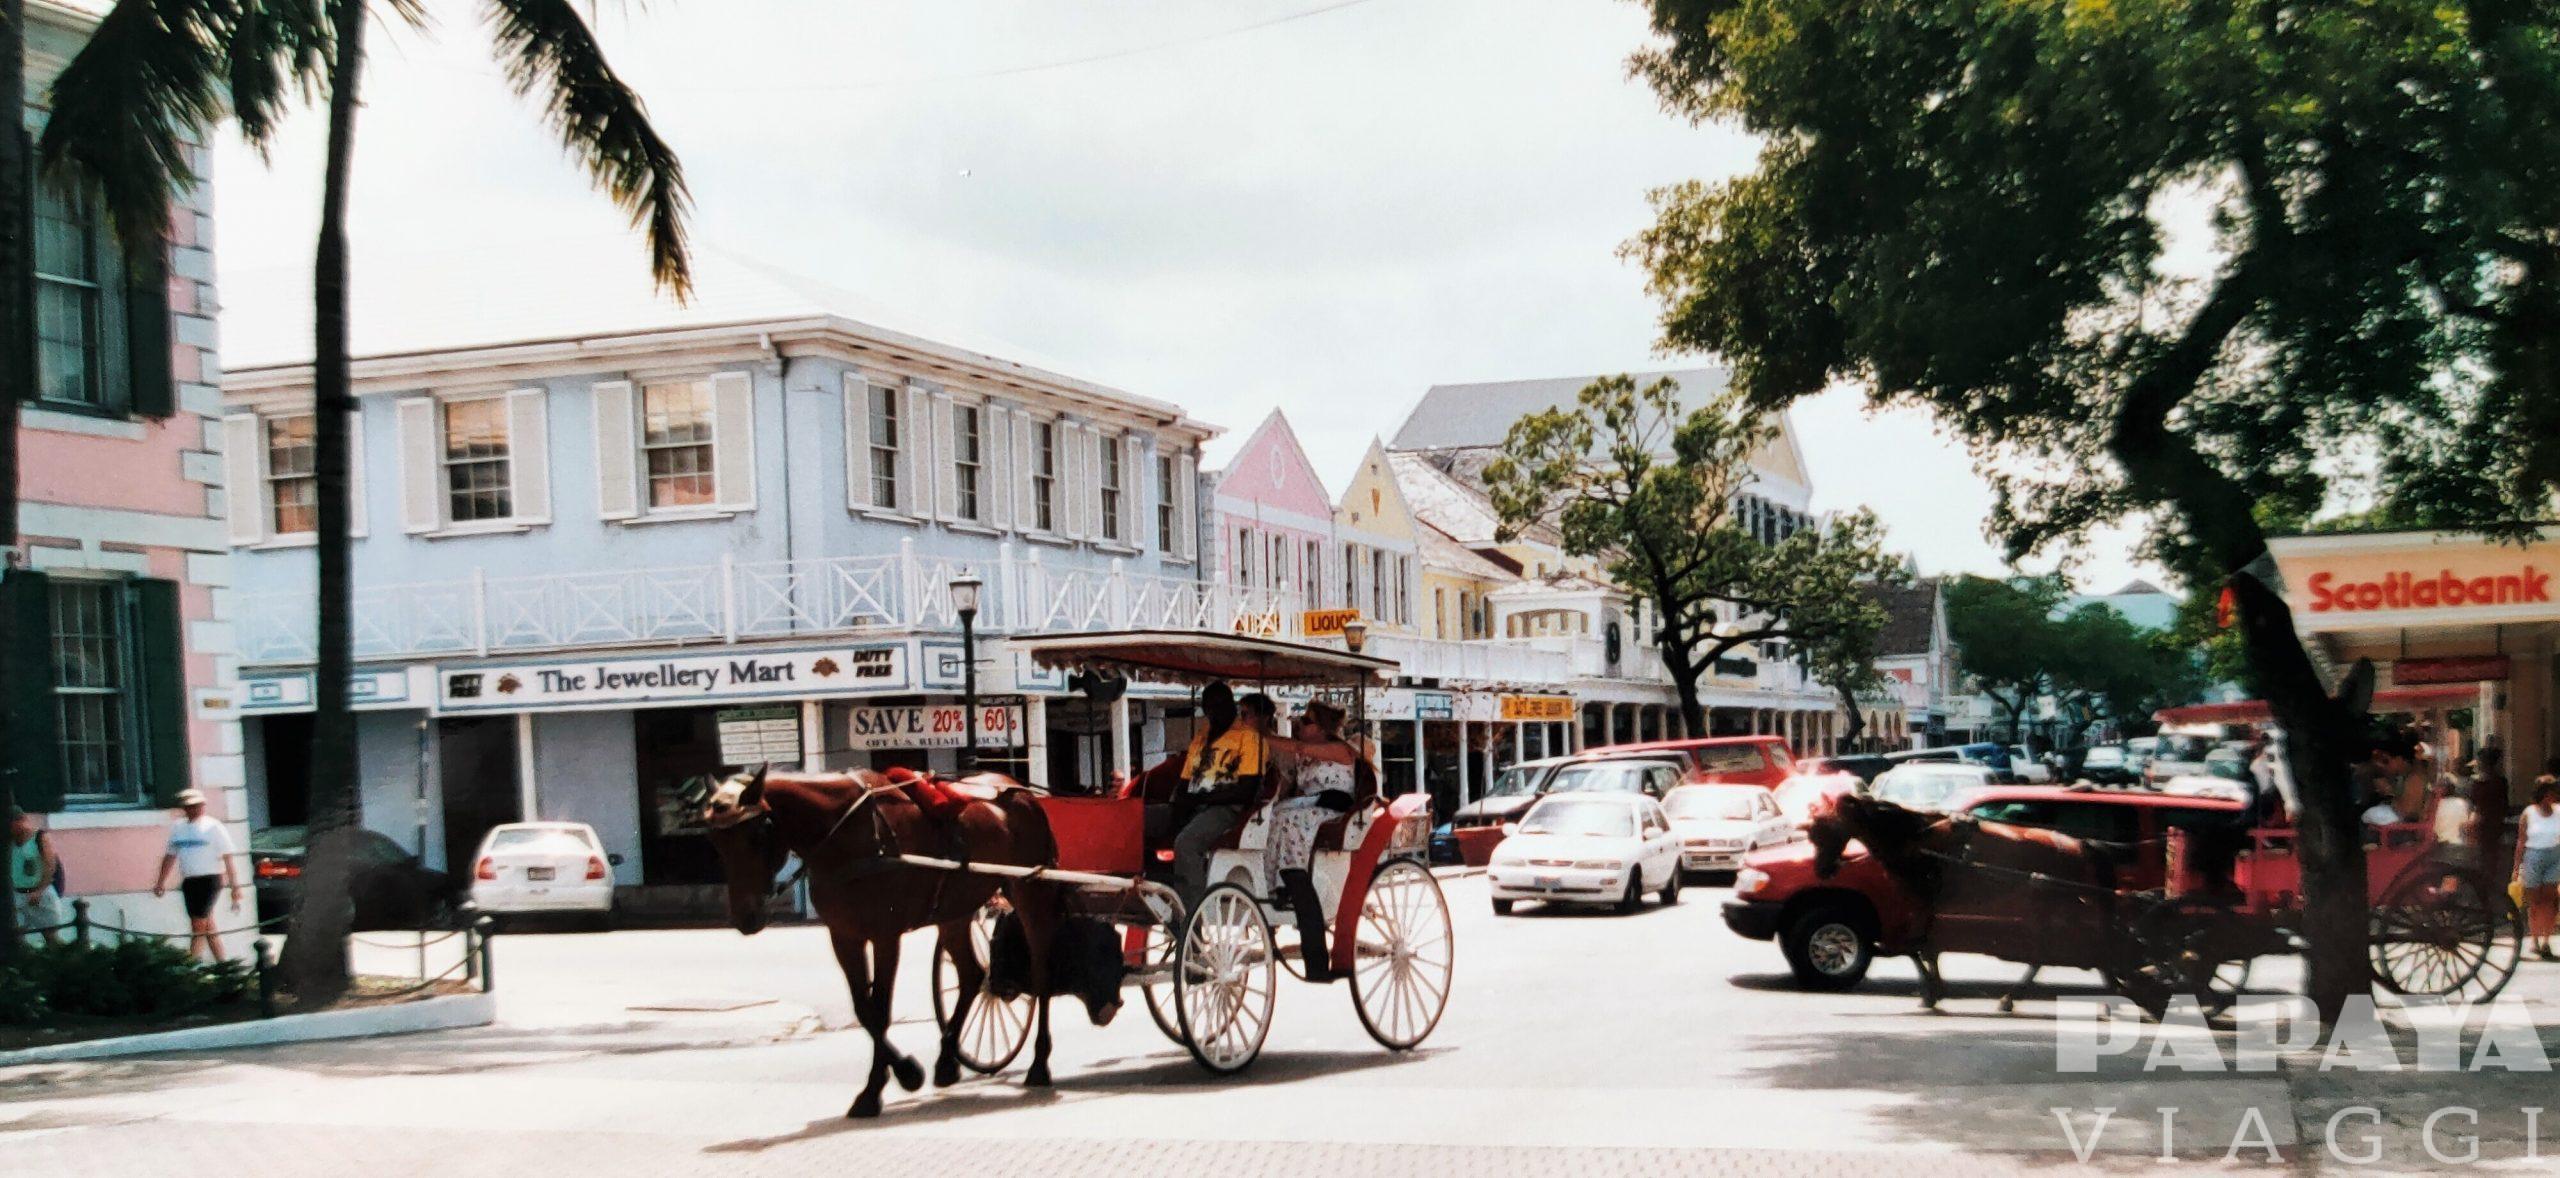 Bahamas, l'arcipelago delle meraviglie